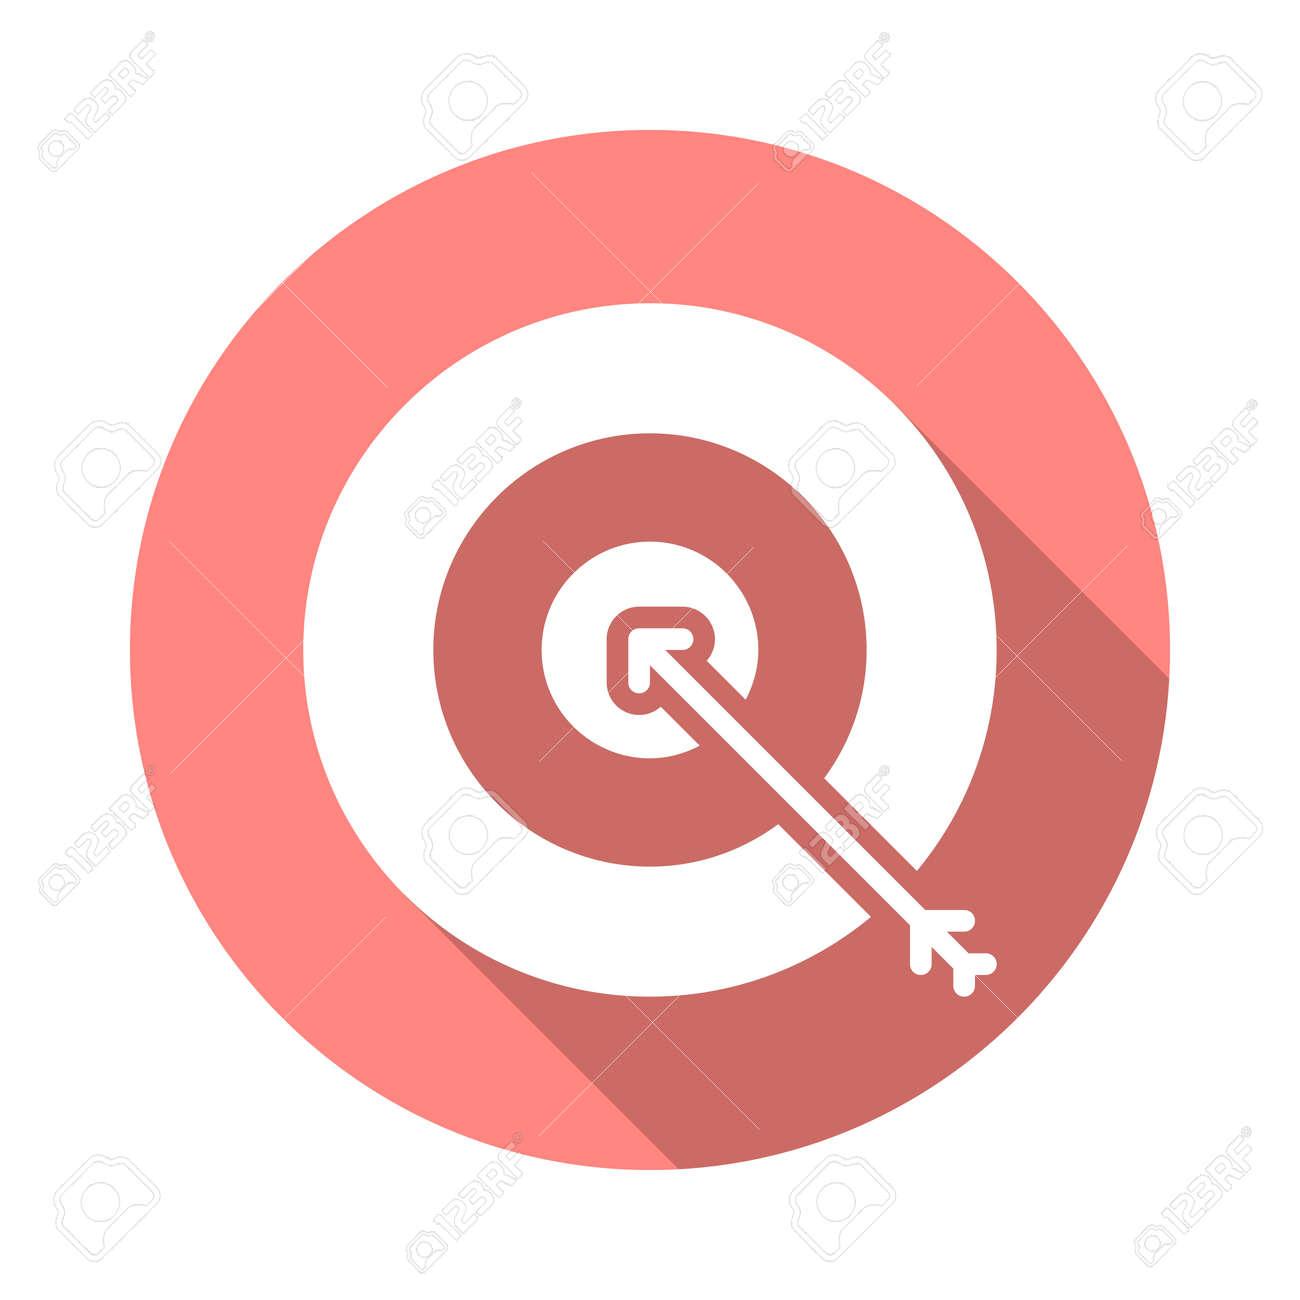 target goal flat icon round colorful button bullseye circular rh 123rf com target free vector download target australia logo vector